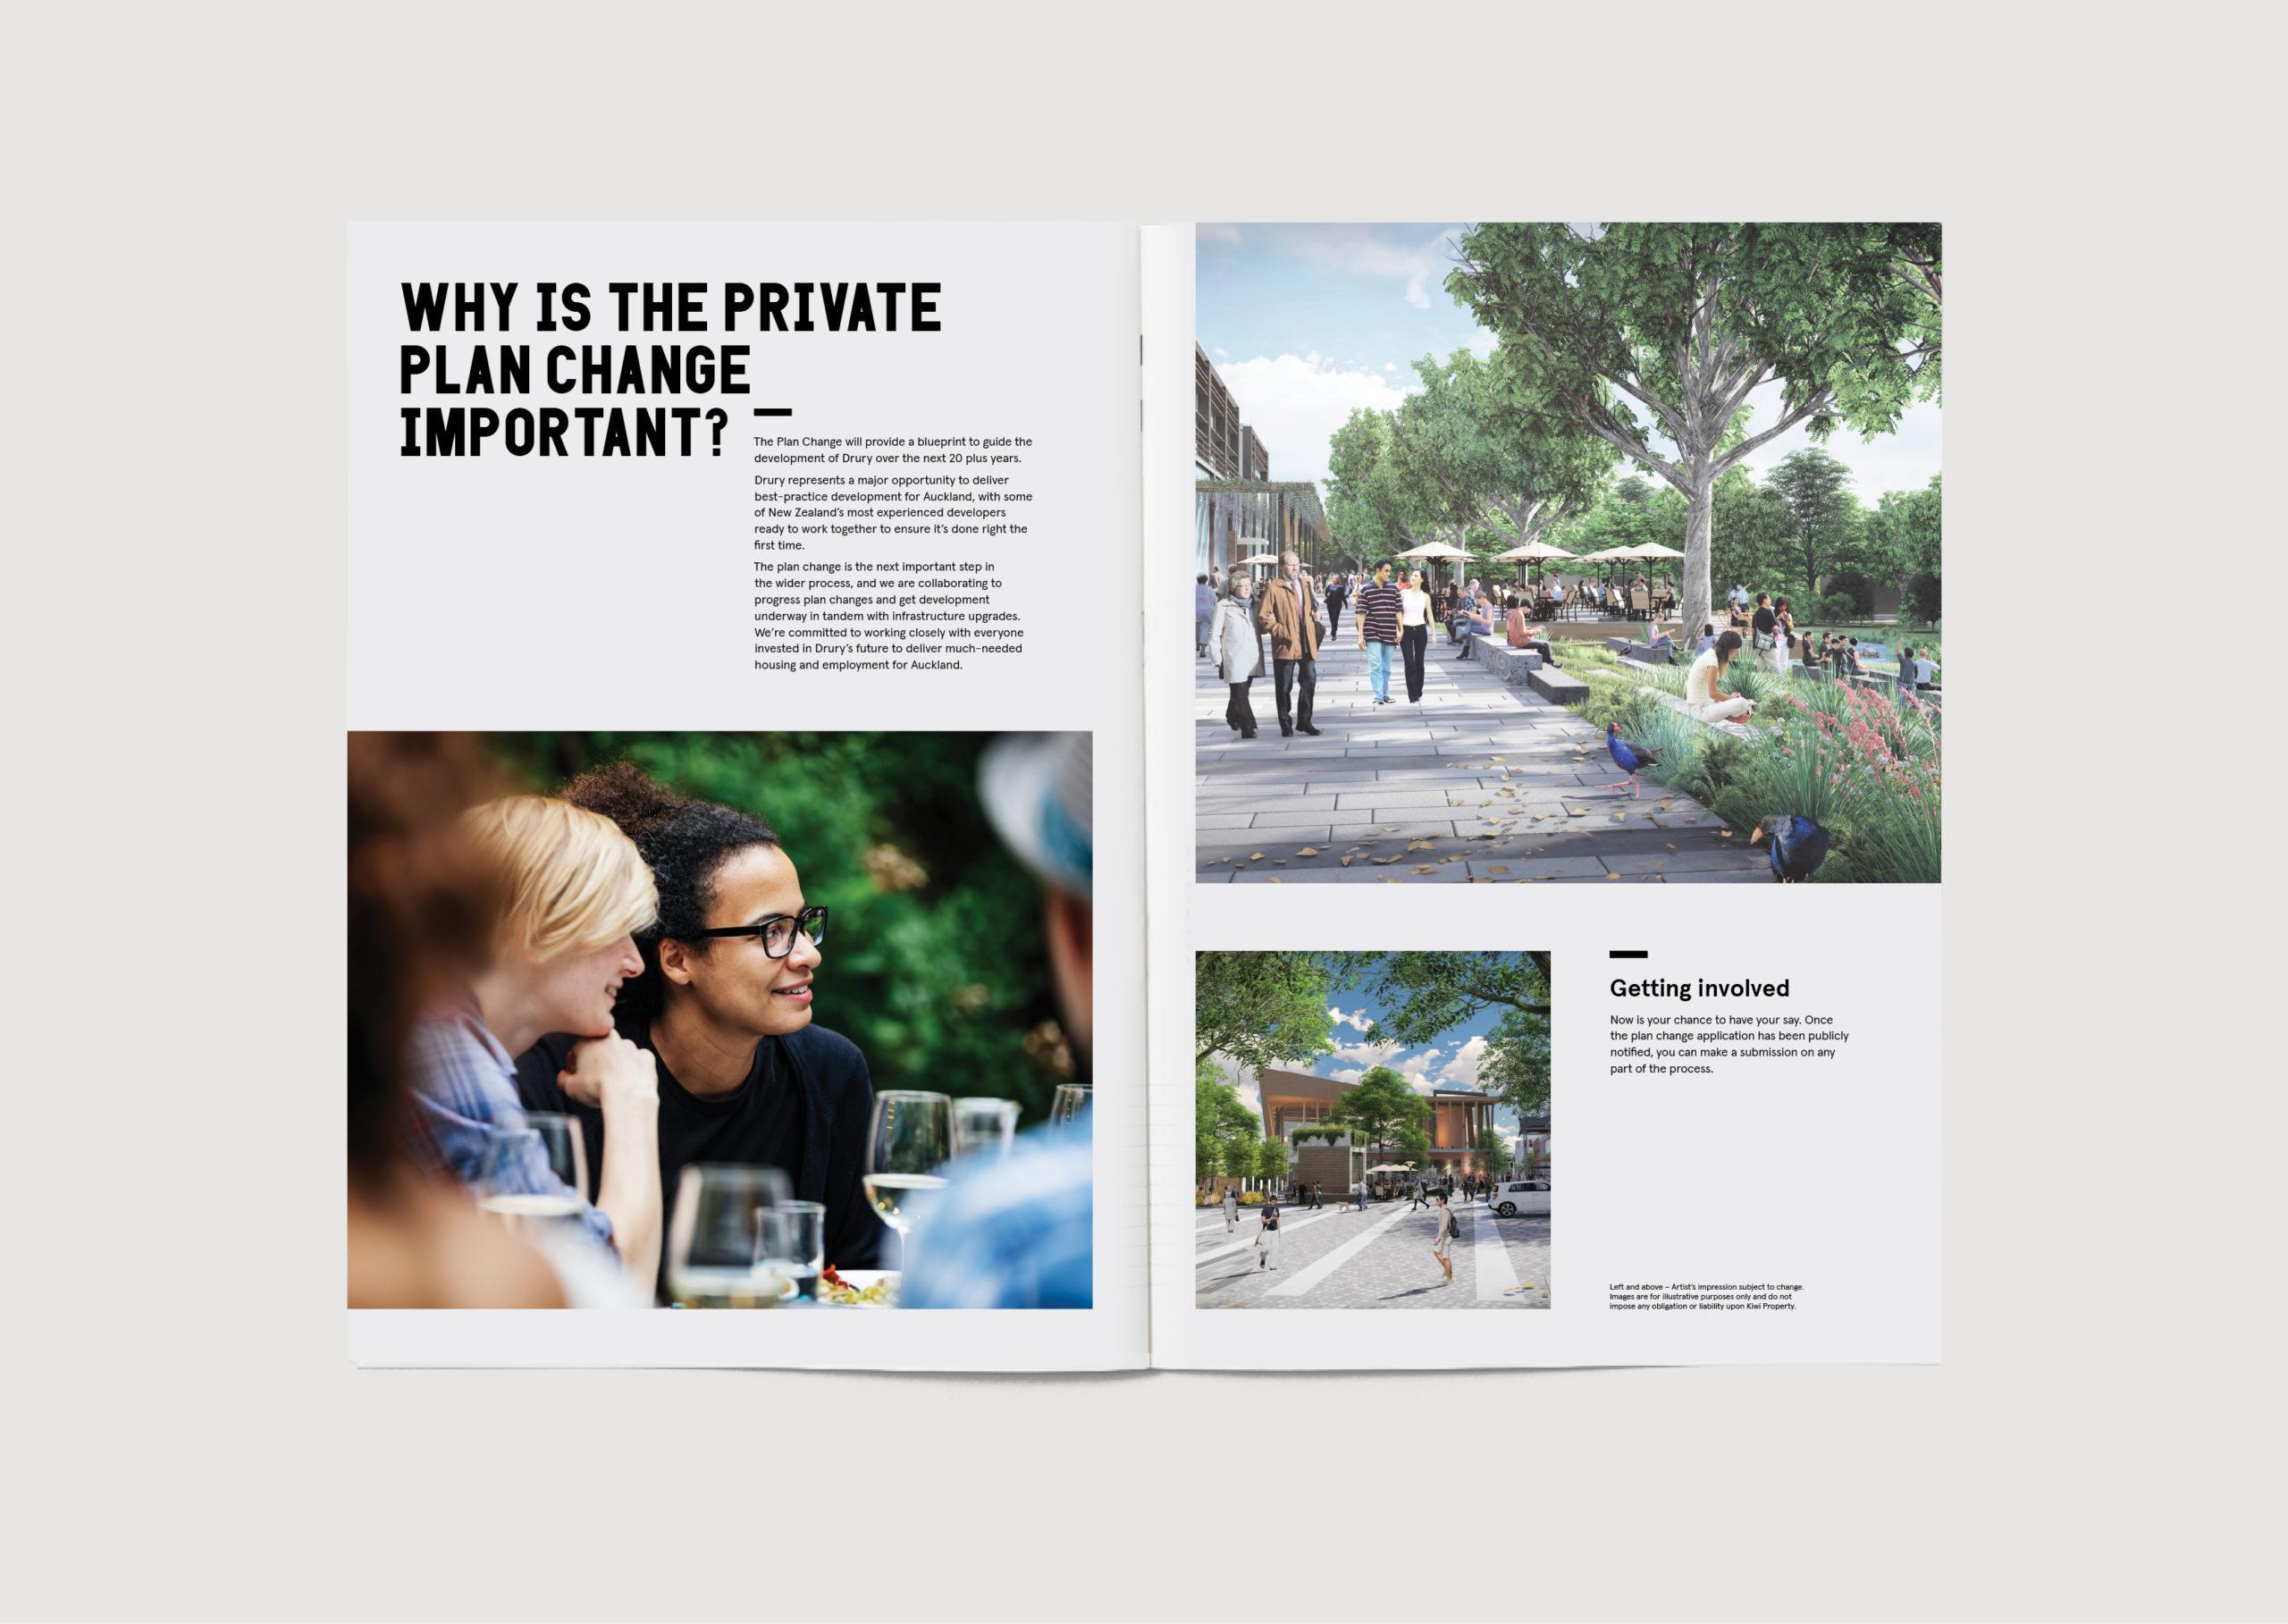 Drury Development Communication Community Update Brochure spread showing future outdoor development render